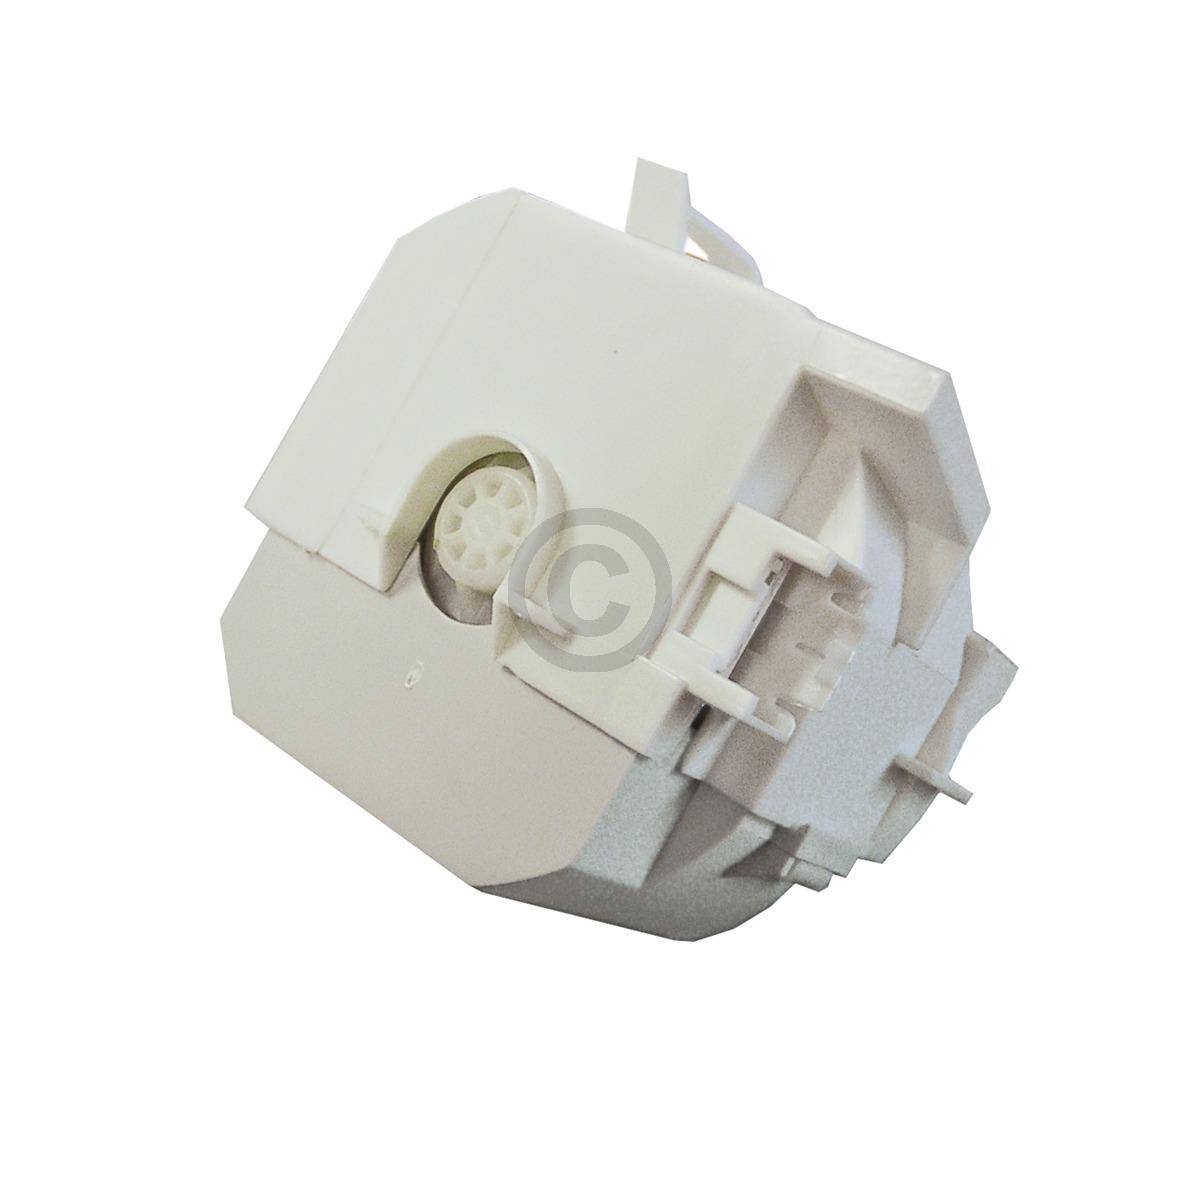 Ablaufpumpe Solo 00620774 620774 Bosch, Siemens, Neff